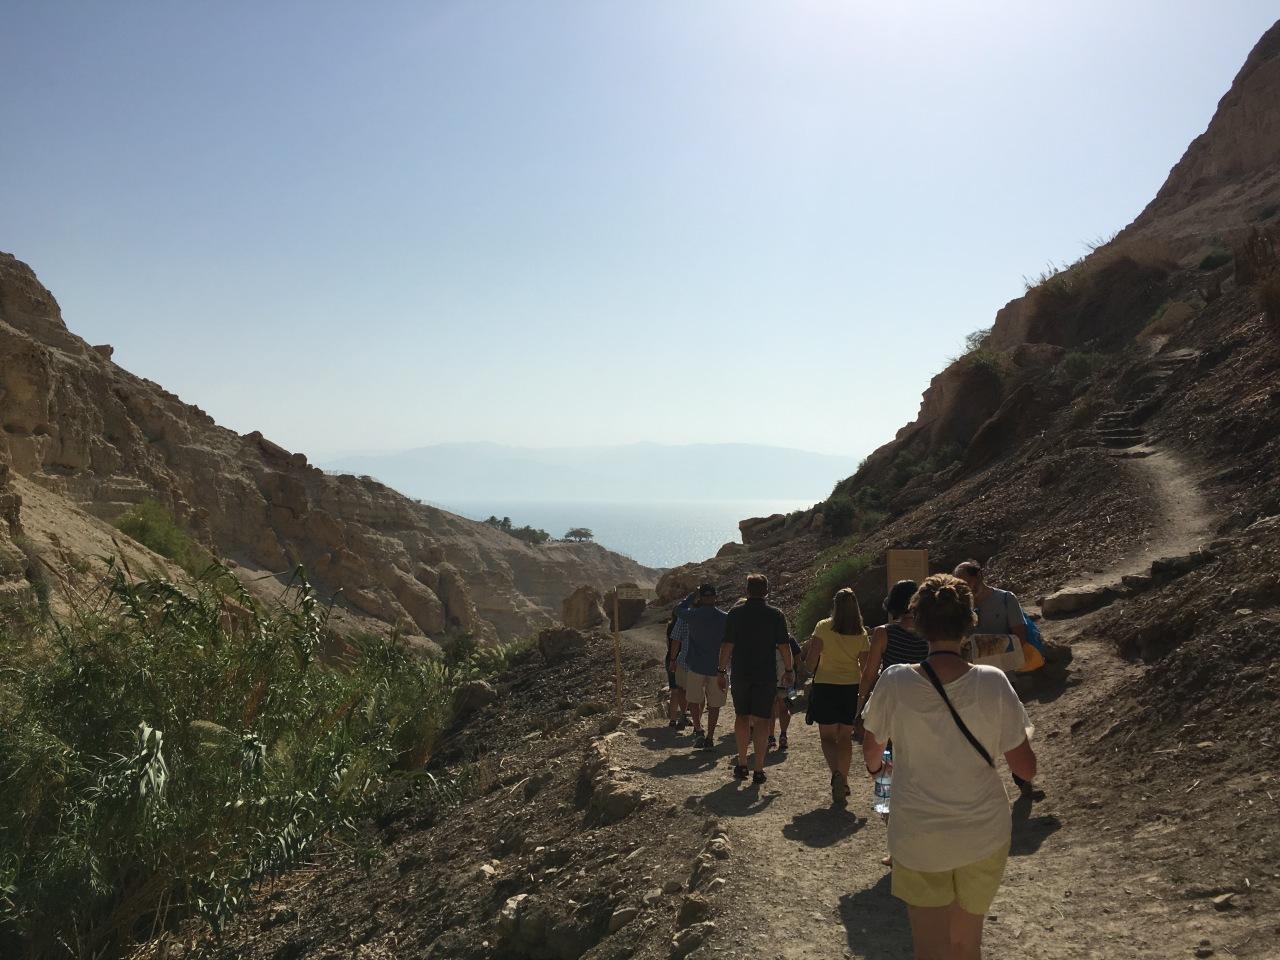 Hiking near the Dead Sea